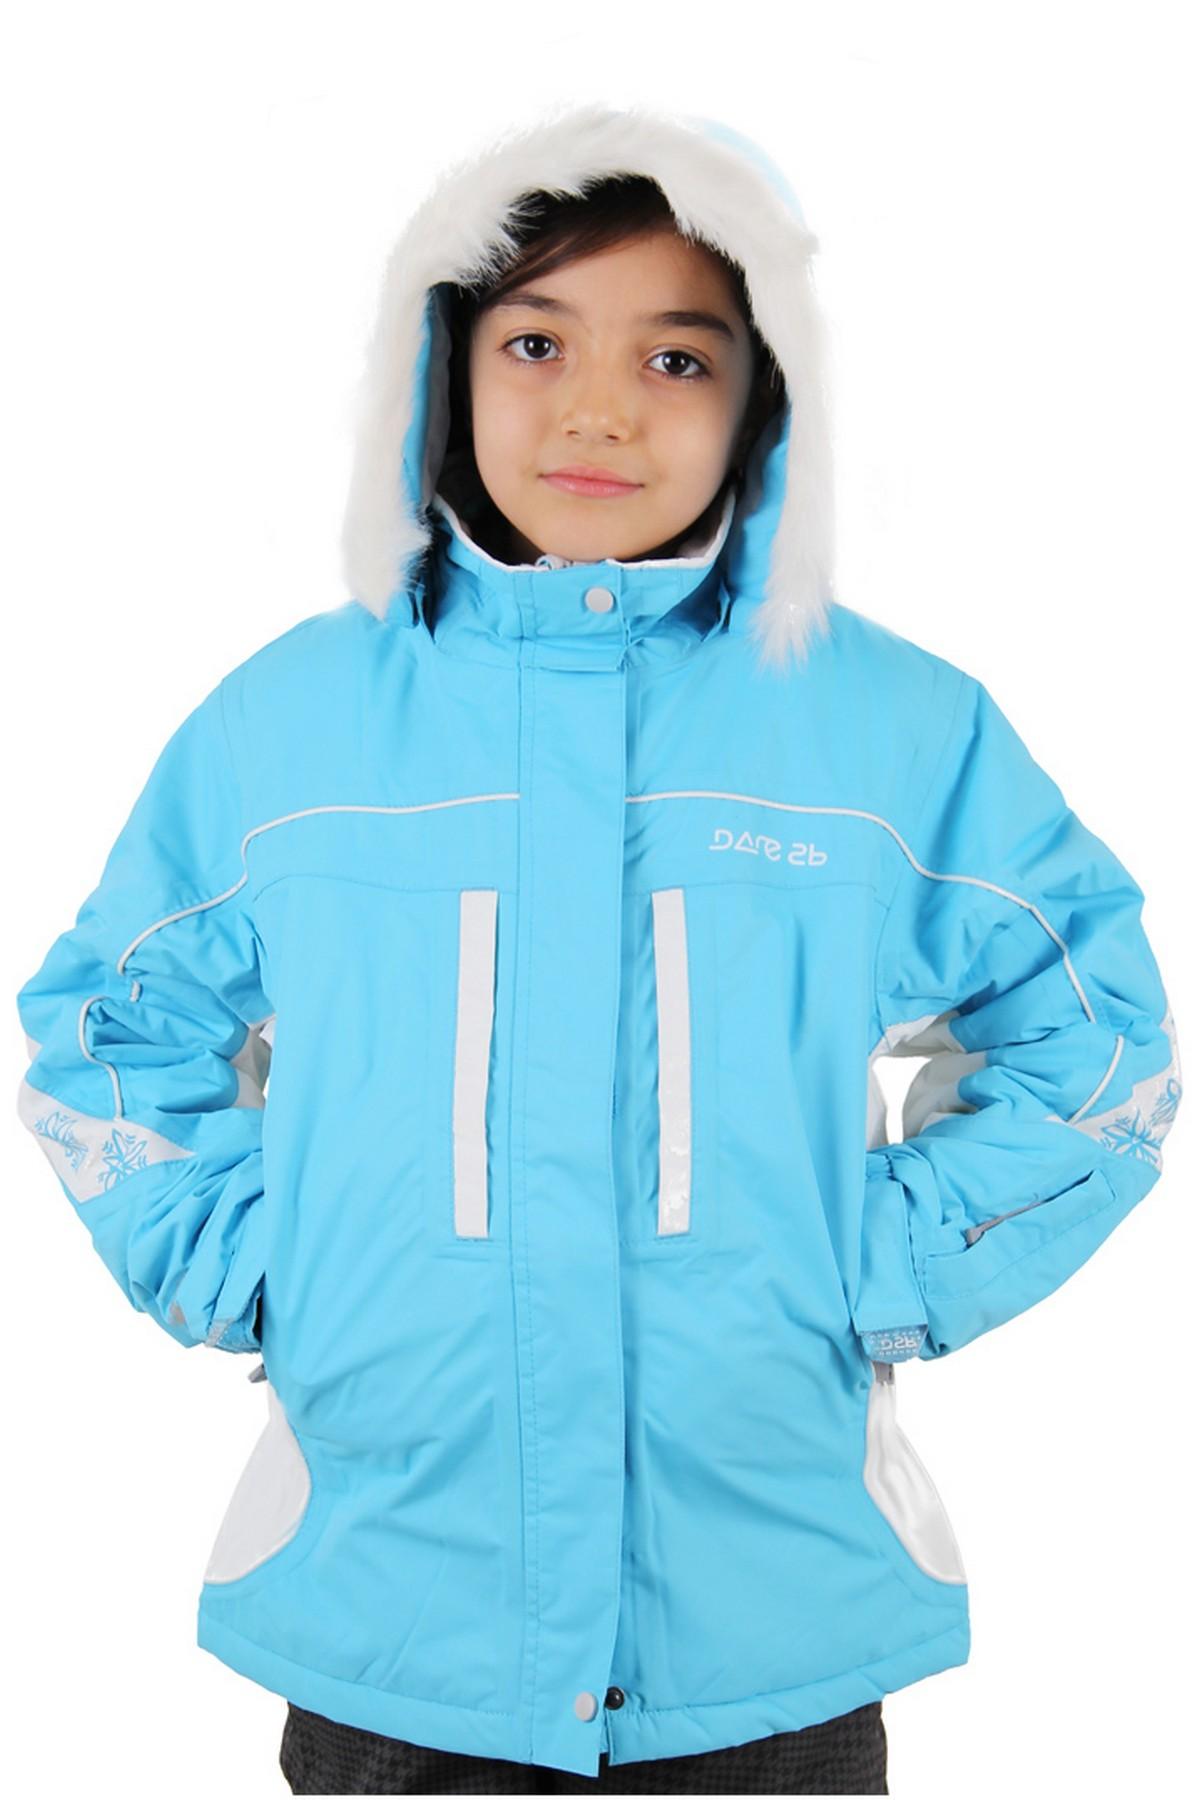 Dare2b Çocuk Mont Mavi (DKA991-43R)